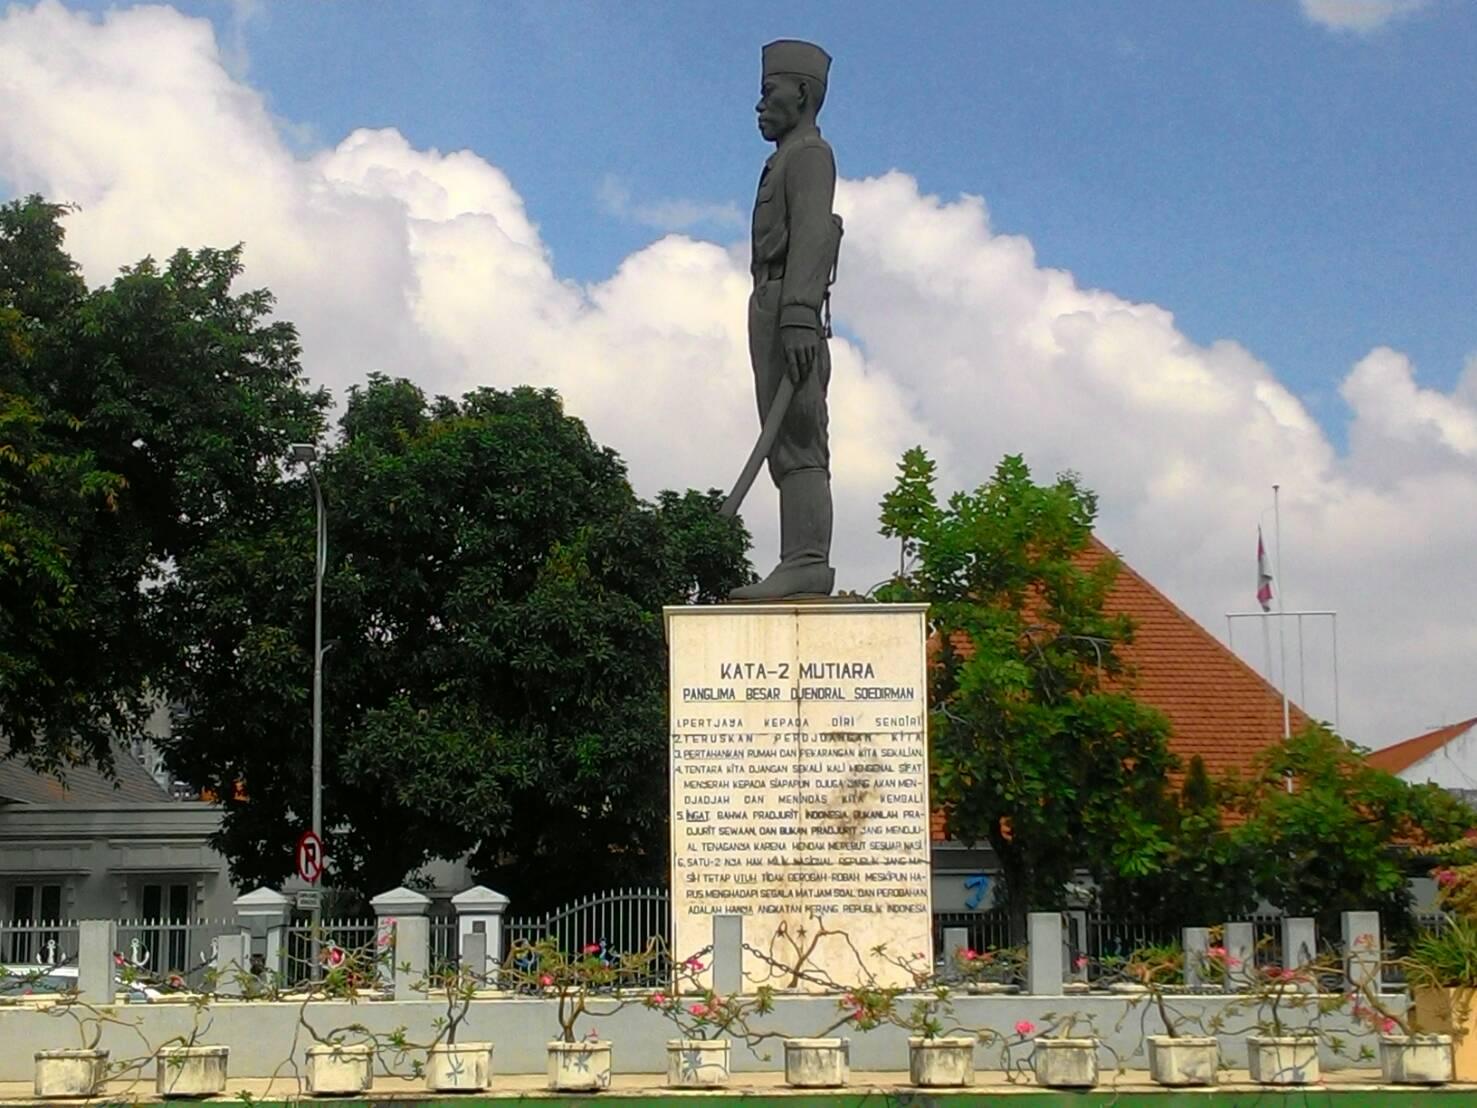 Monumen Panglima Besar Jenderal Sudirman Megah Surabaya Jendral Soedirman Jawa